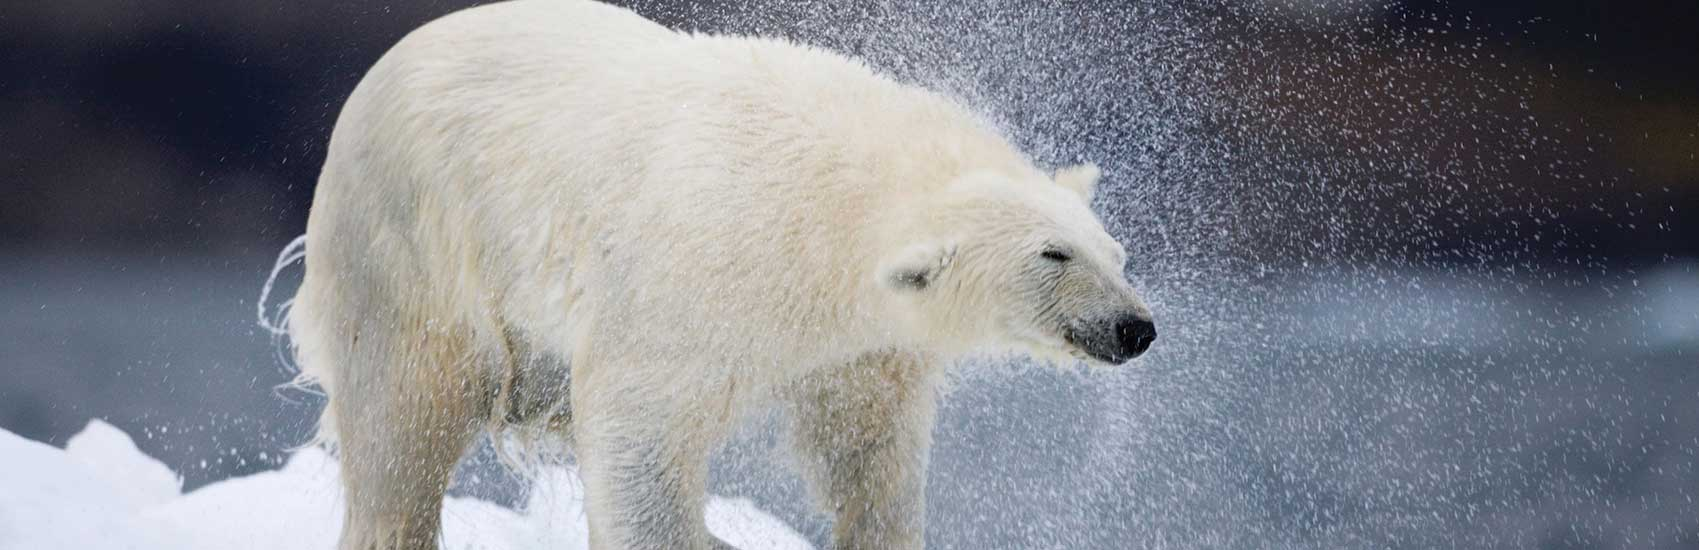 Early Bonus Savings to the Arctic with Seabourn 1